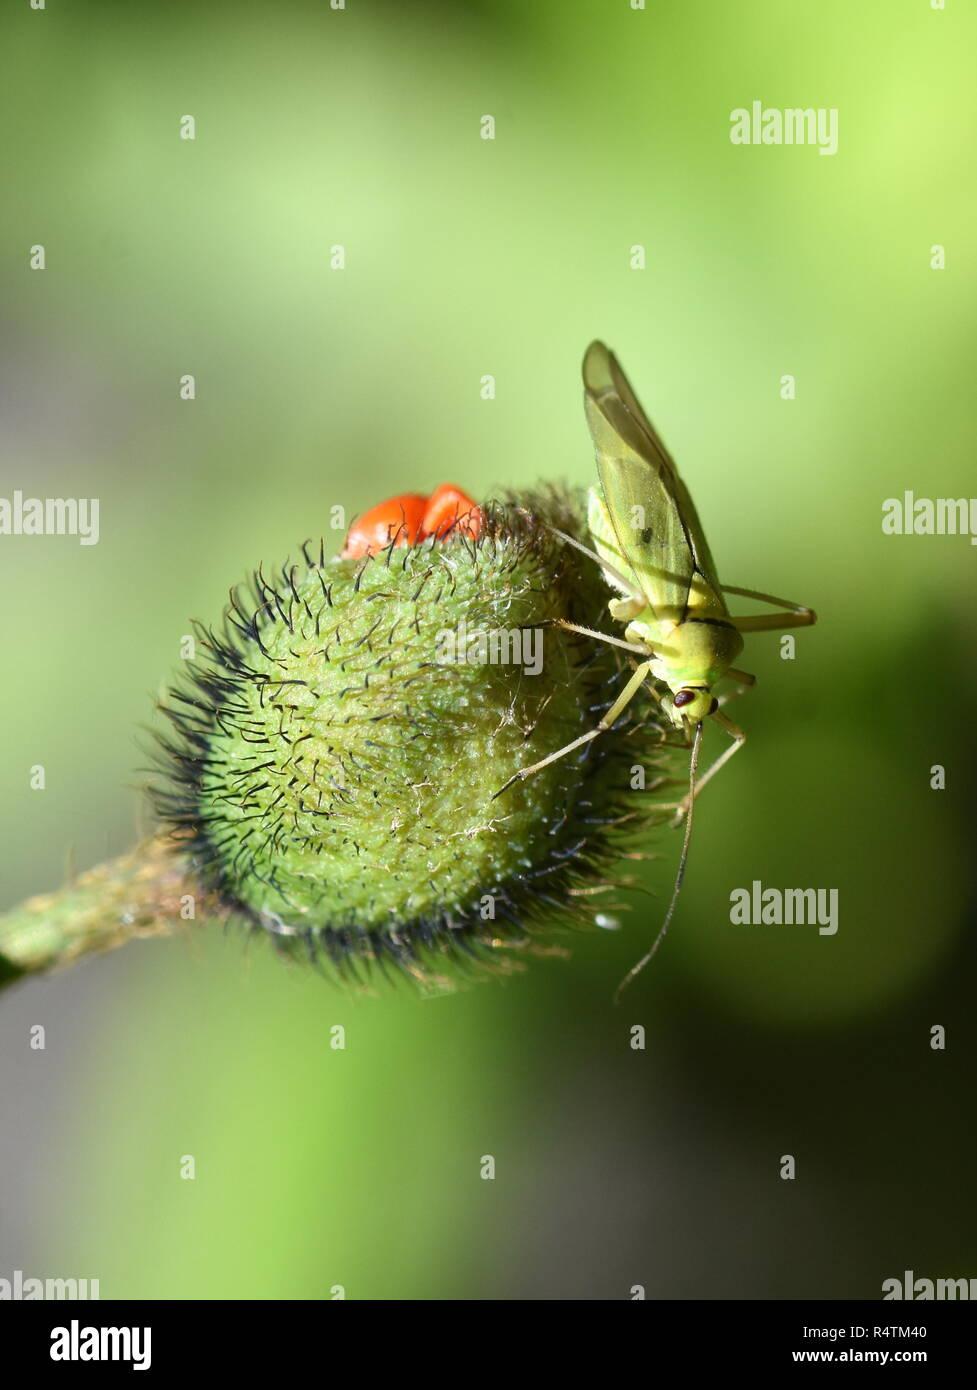 Common green capsid Lygocoris pabulinus sitting on a flower bud - Stock Image